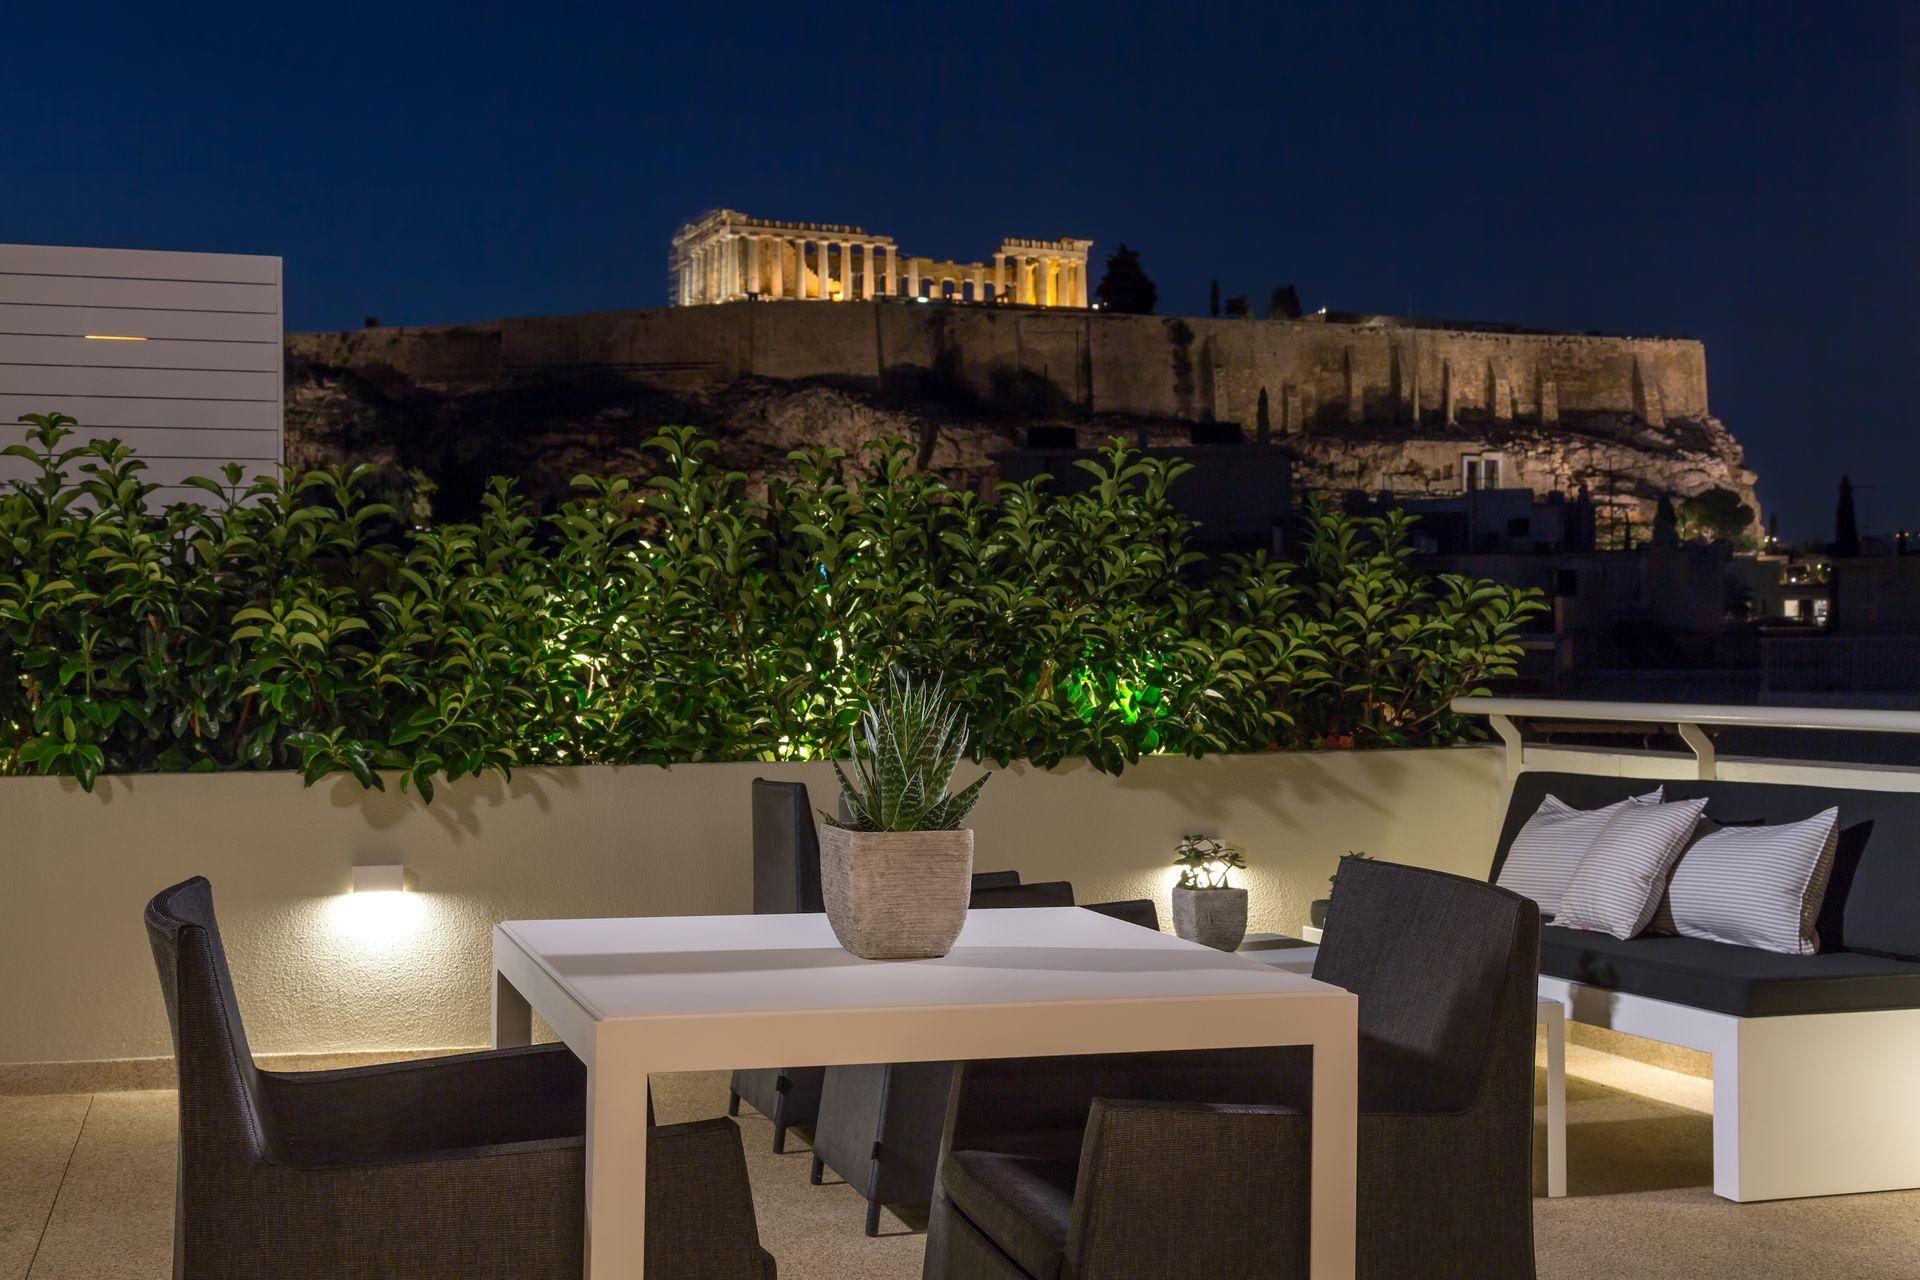 divani palace acropolis greece by antelope travel. Black Bedroom Furniture Sets. Home Design Ideas